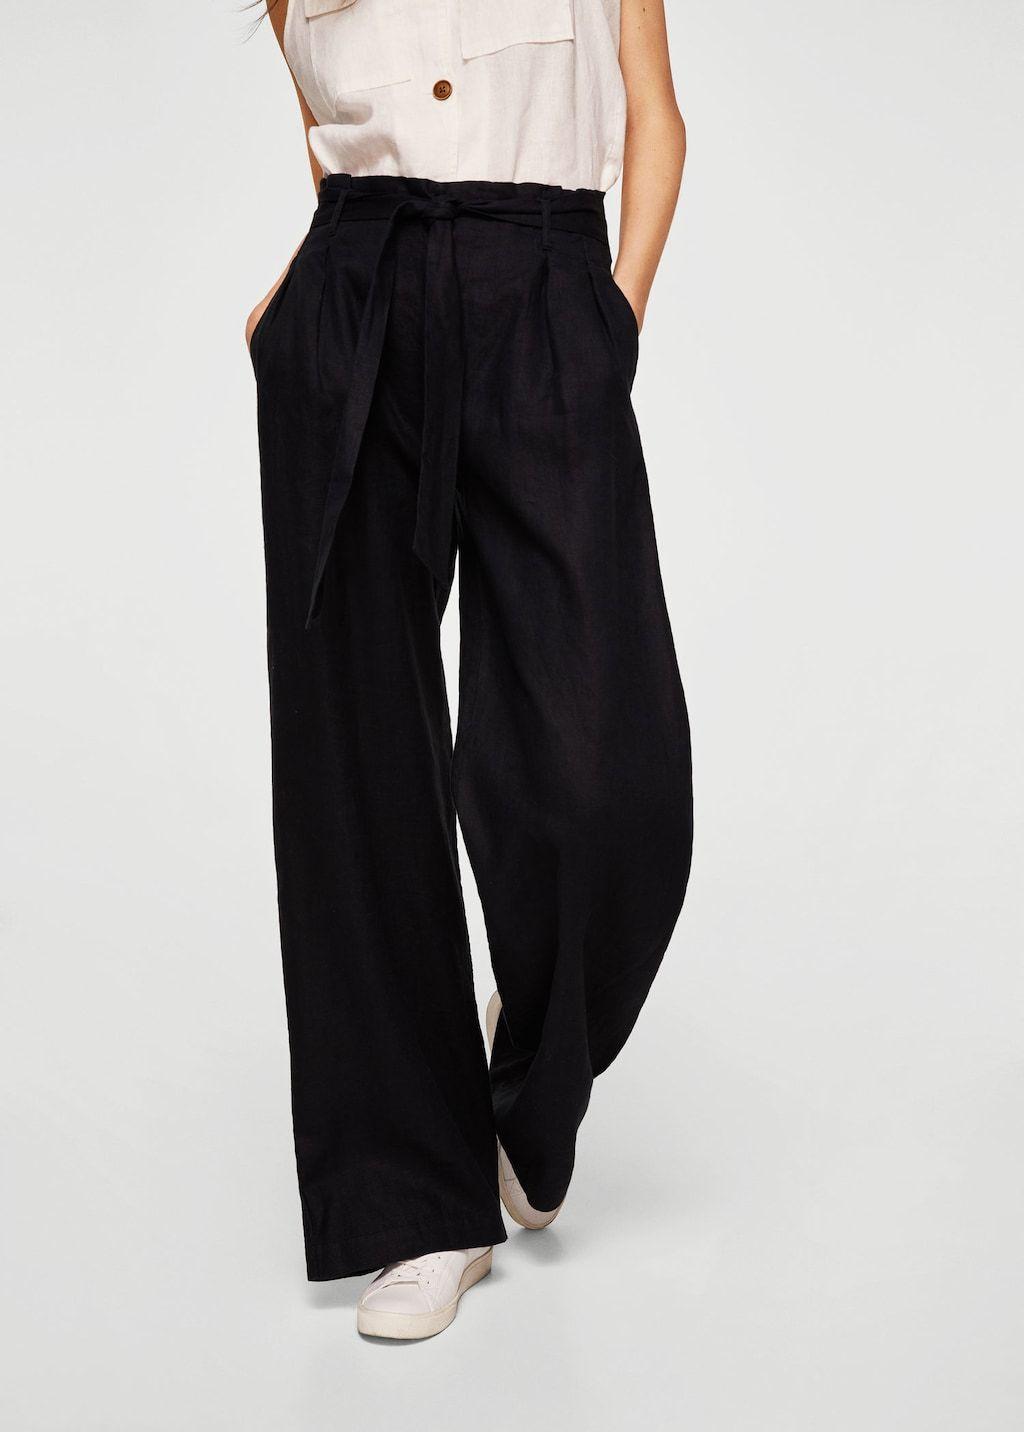 Pantalon Lin Femme Taille Haute